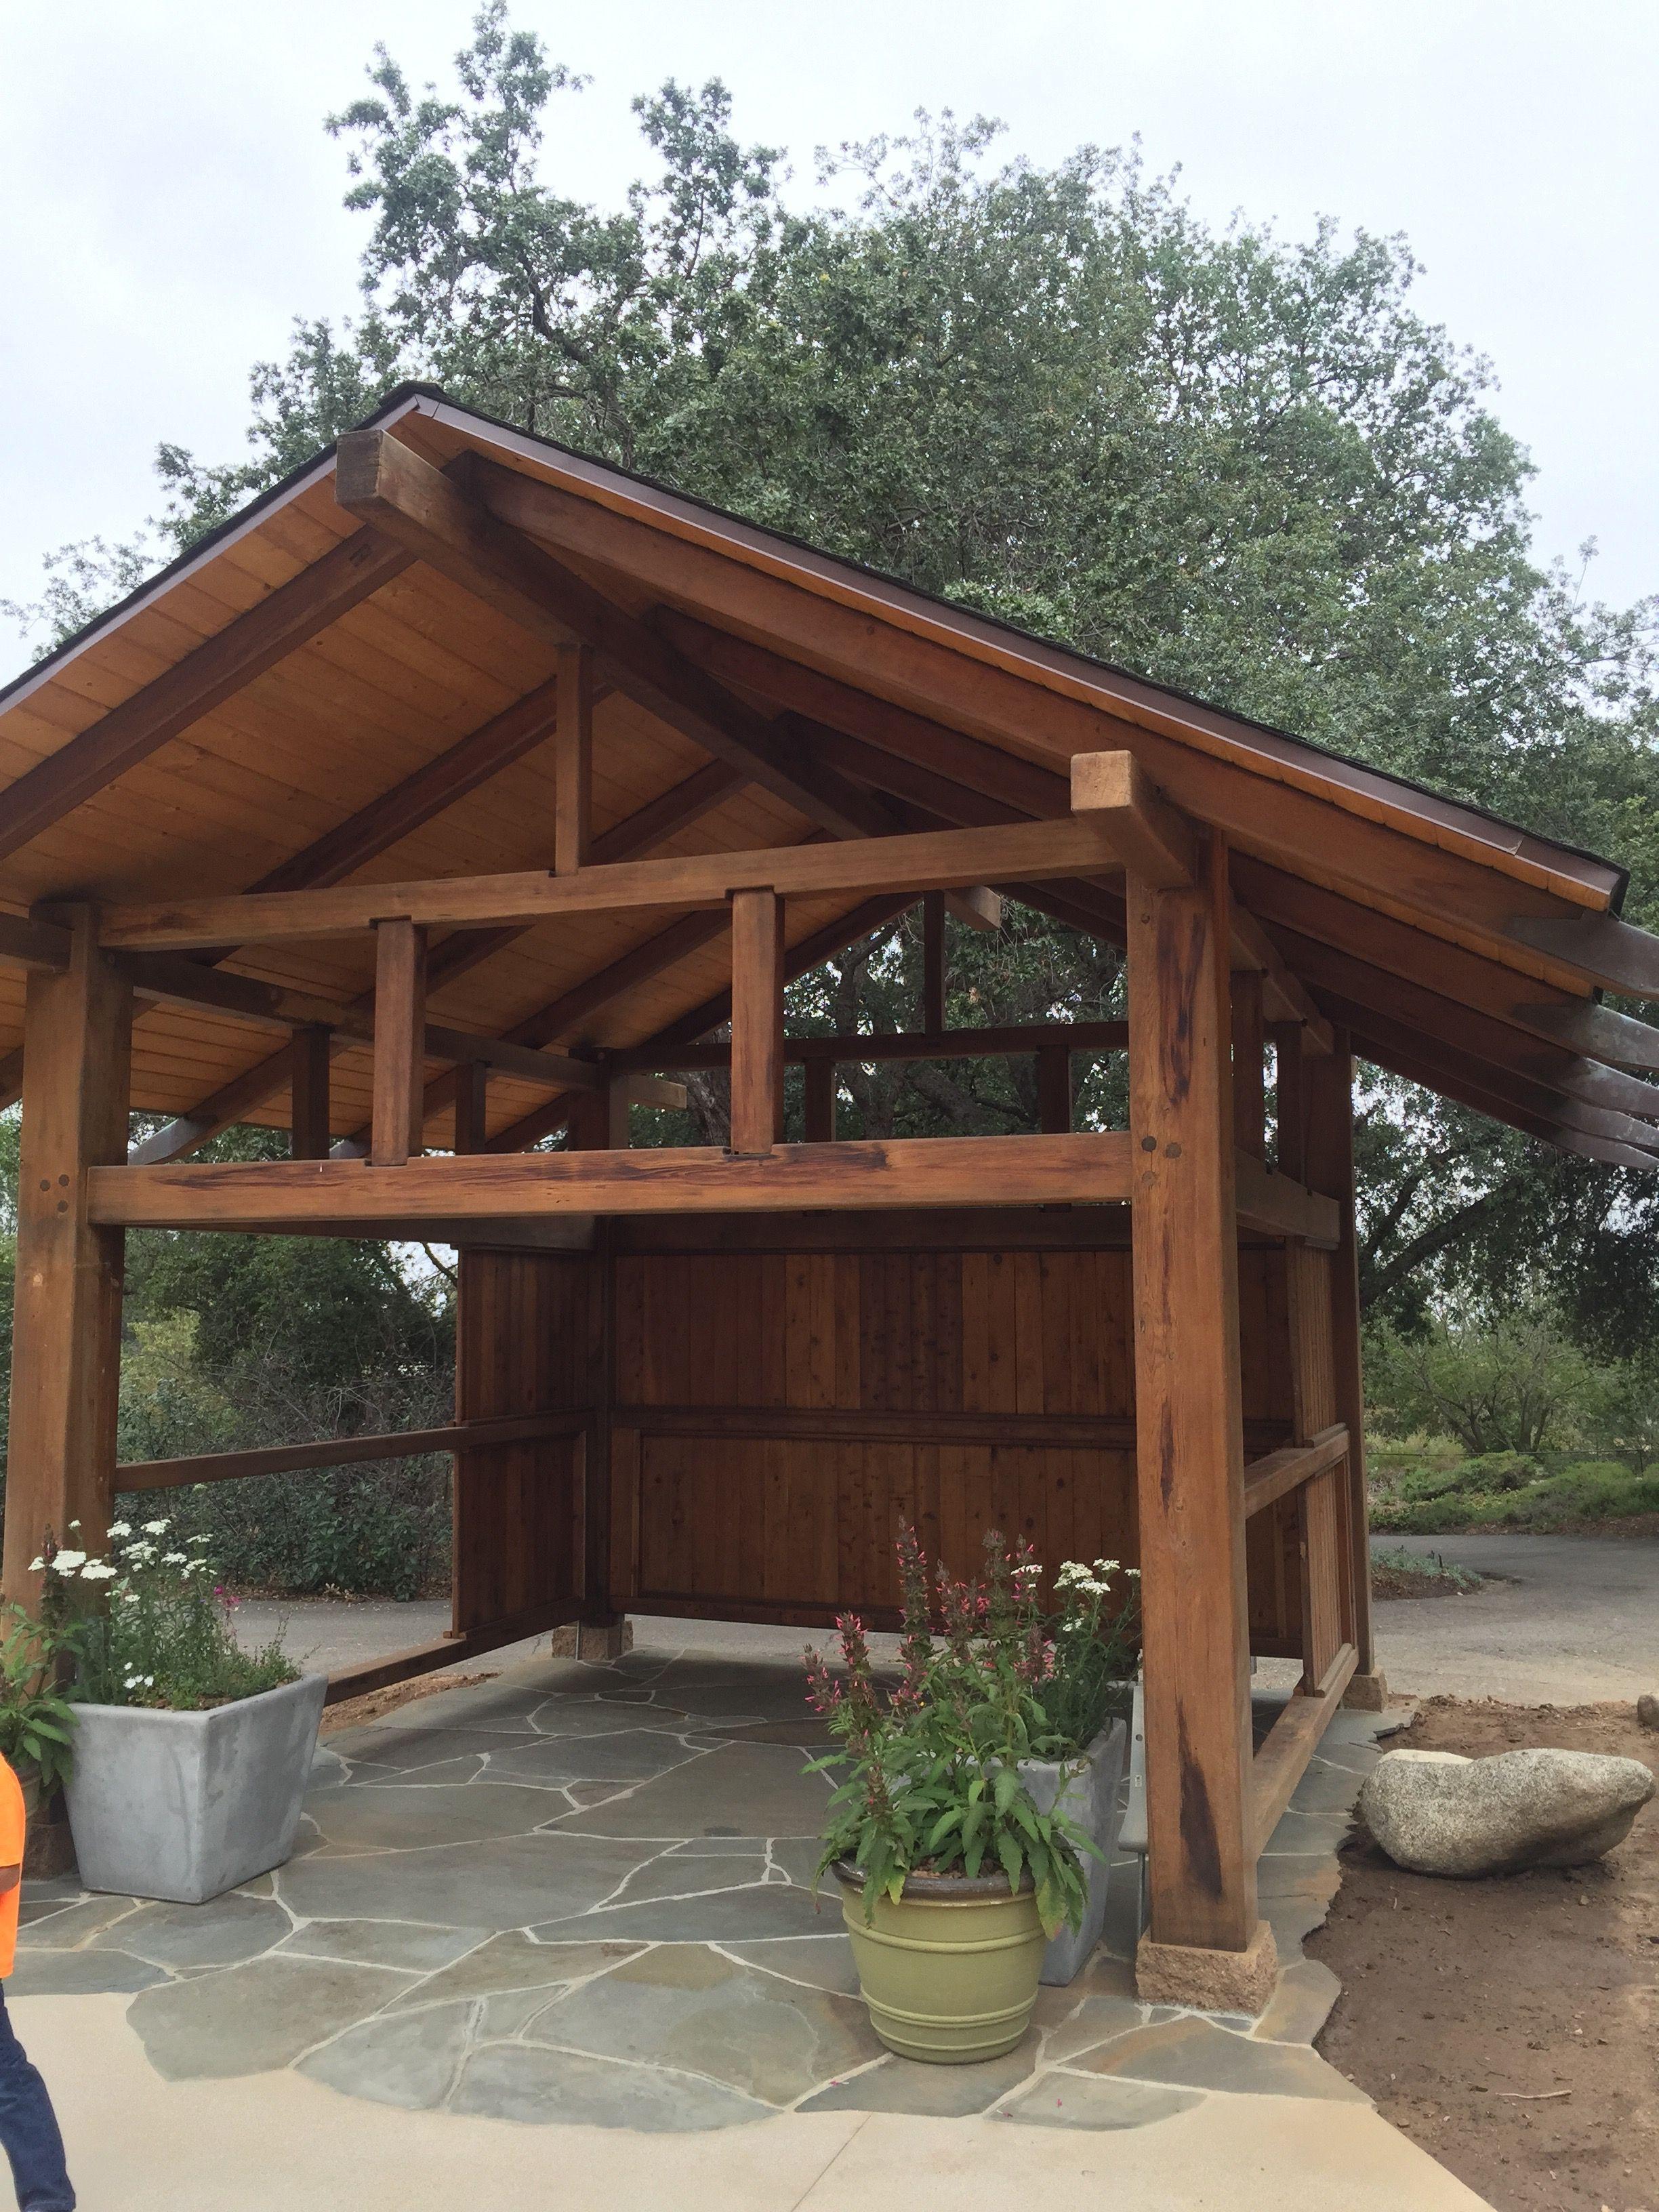 Covered Semi Enclosed Outdoor Patio Cover Room Carport Garage Diy Carport Carport Prices